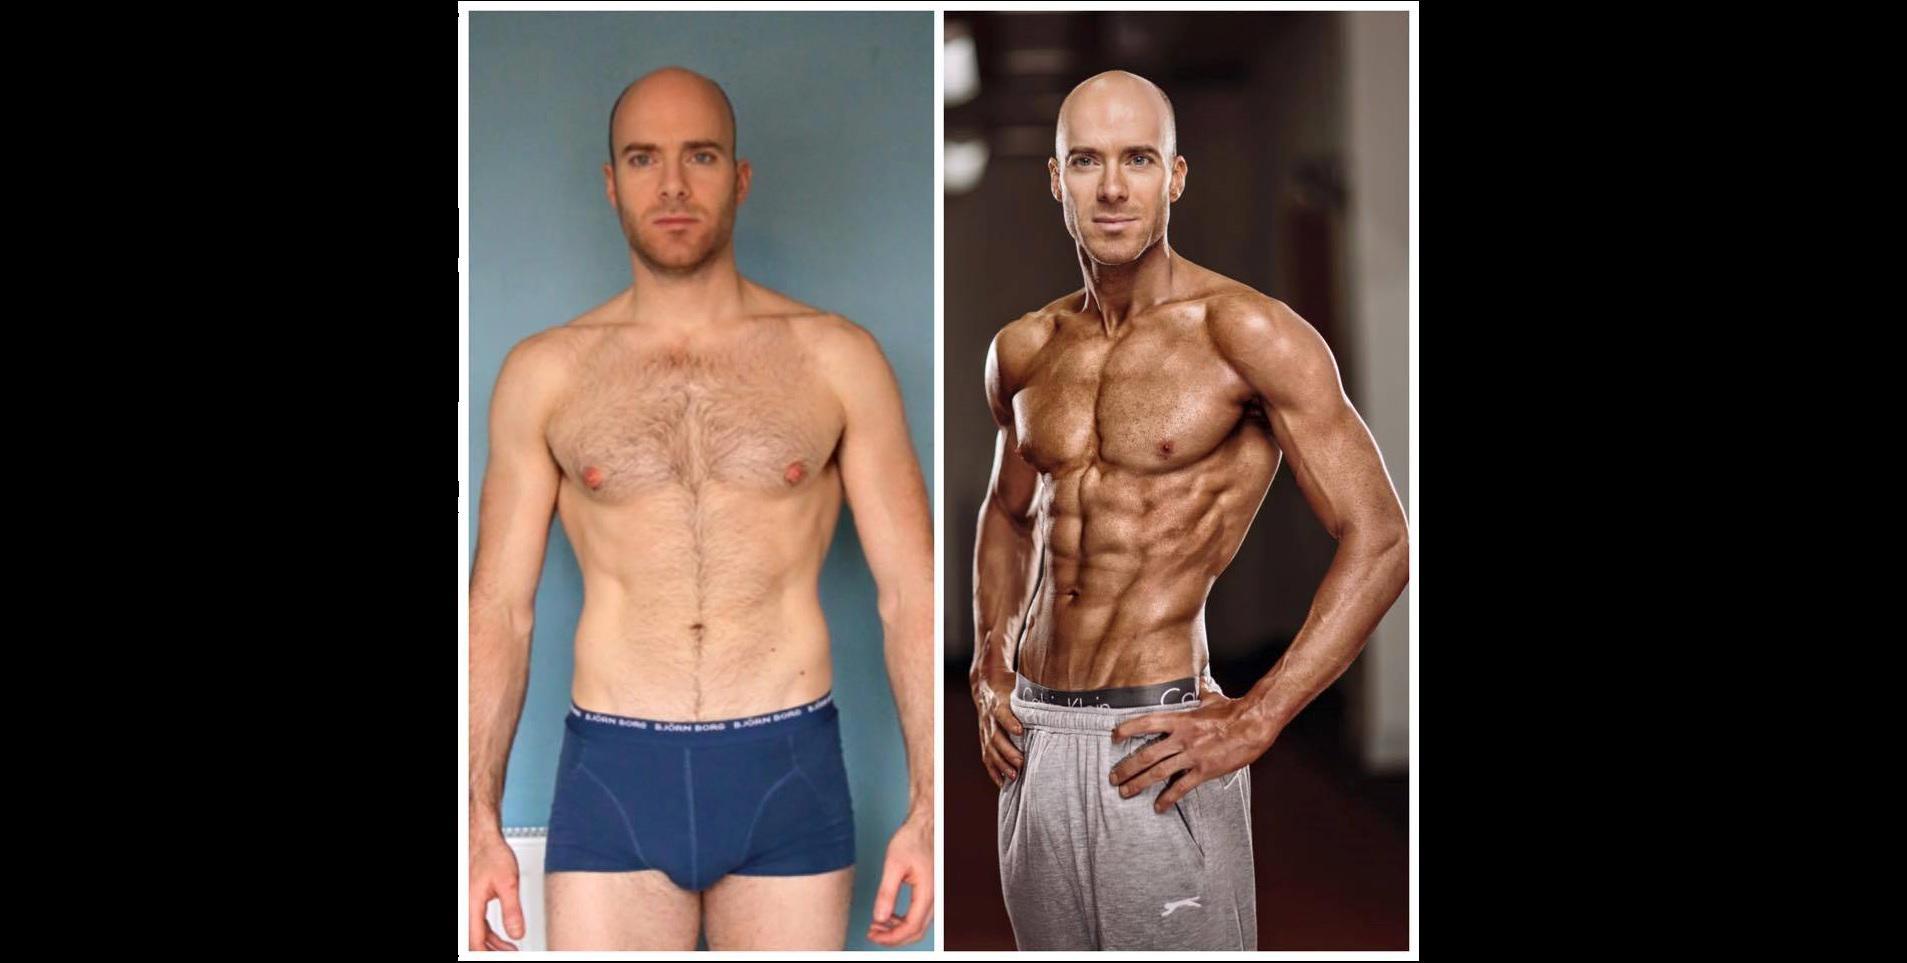 ectomorph steroids transformation